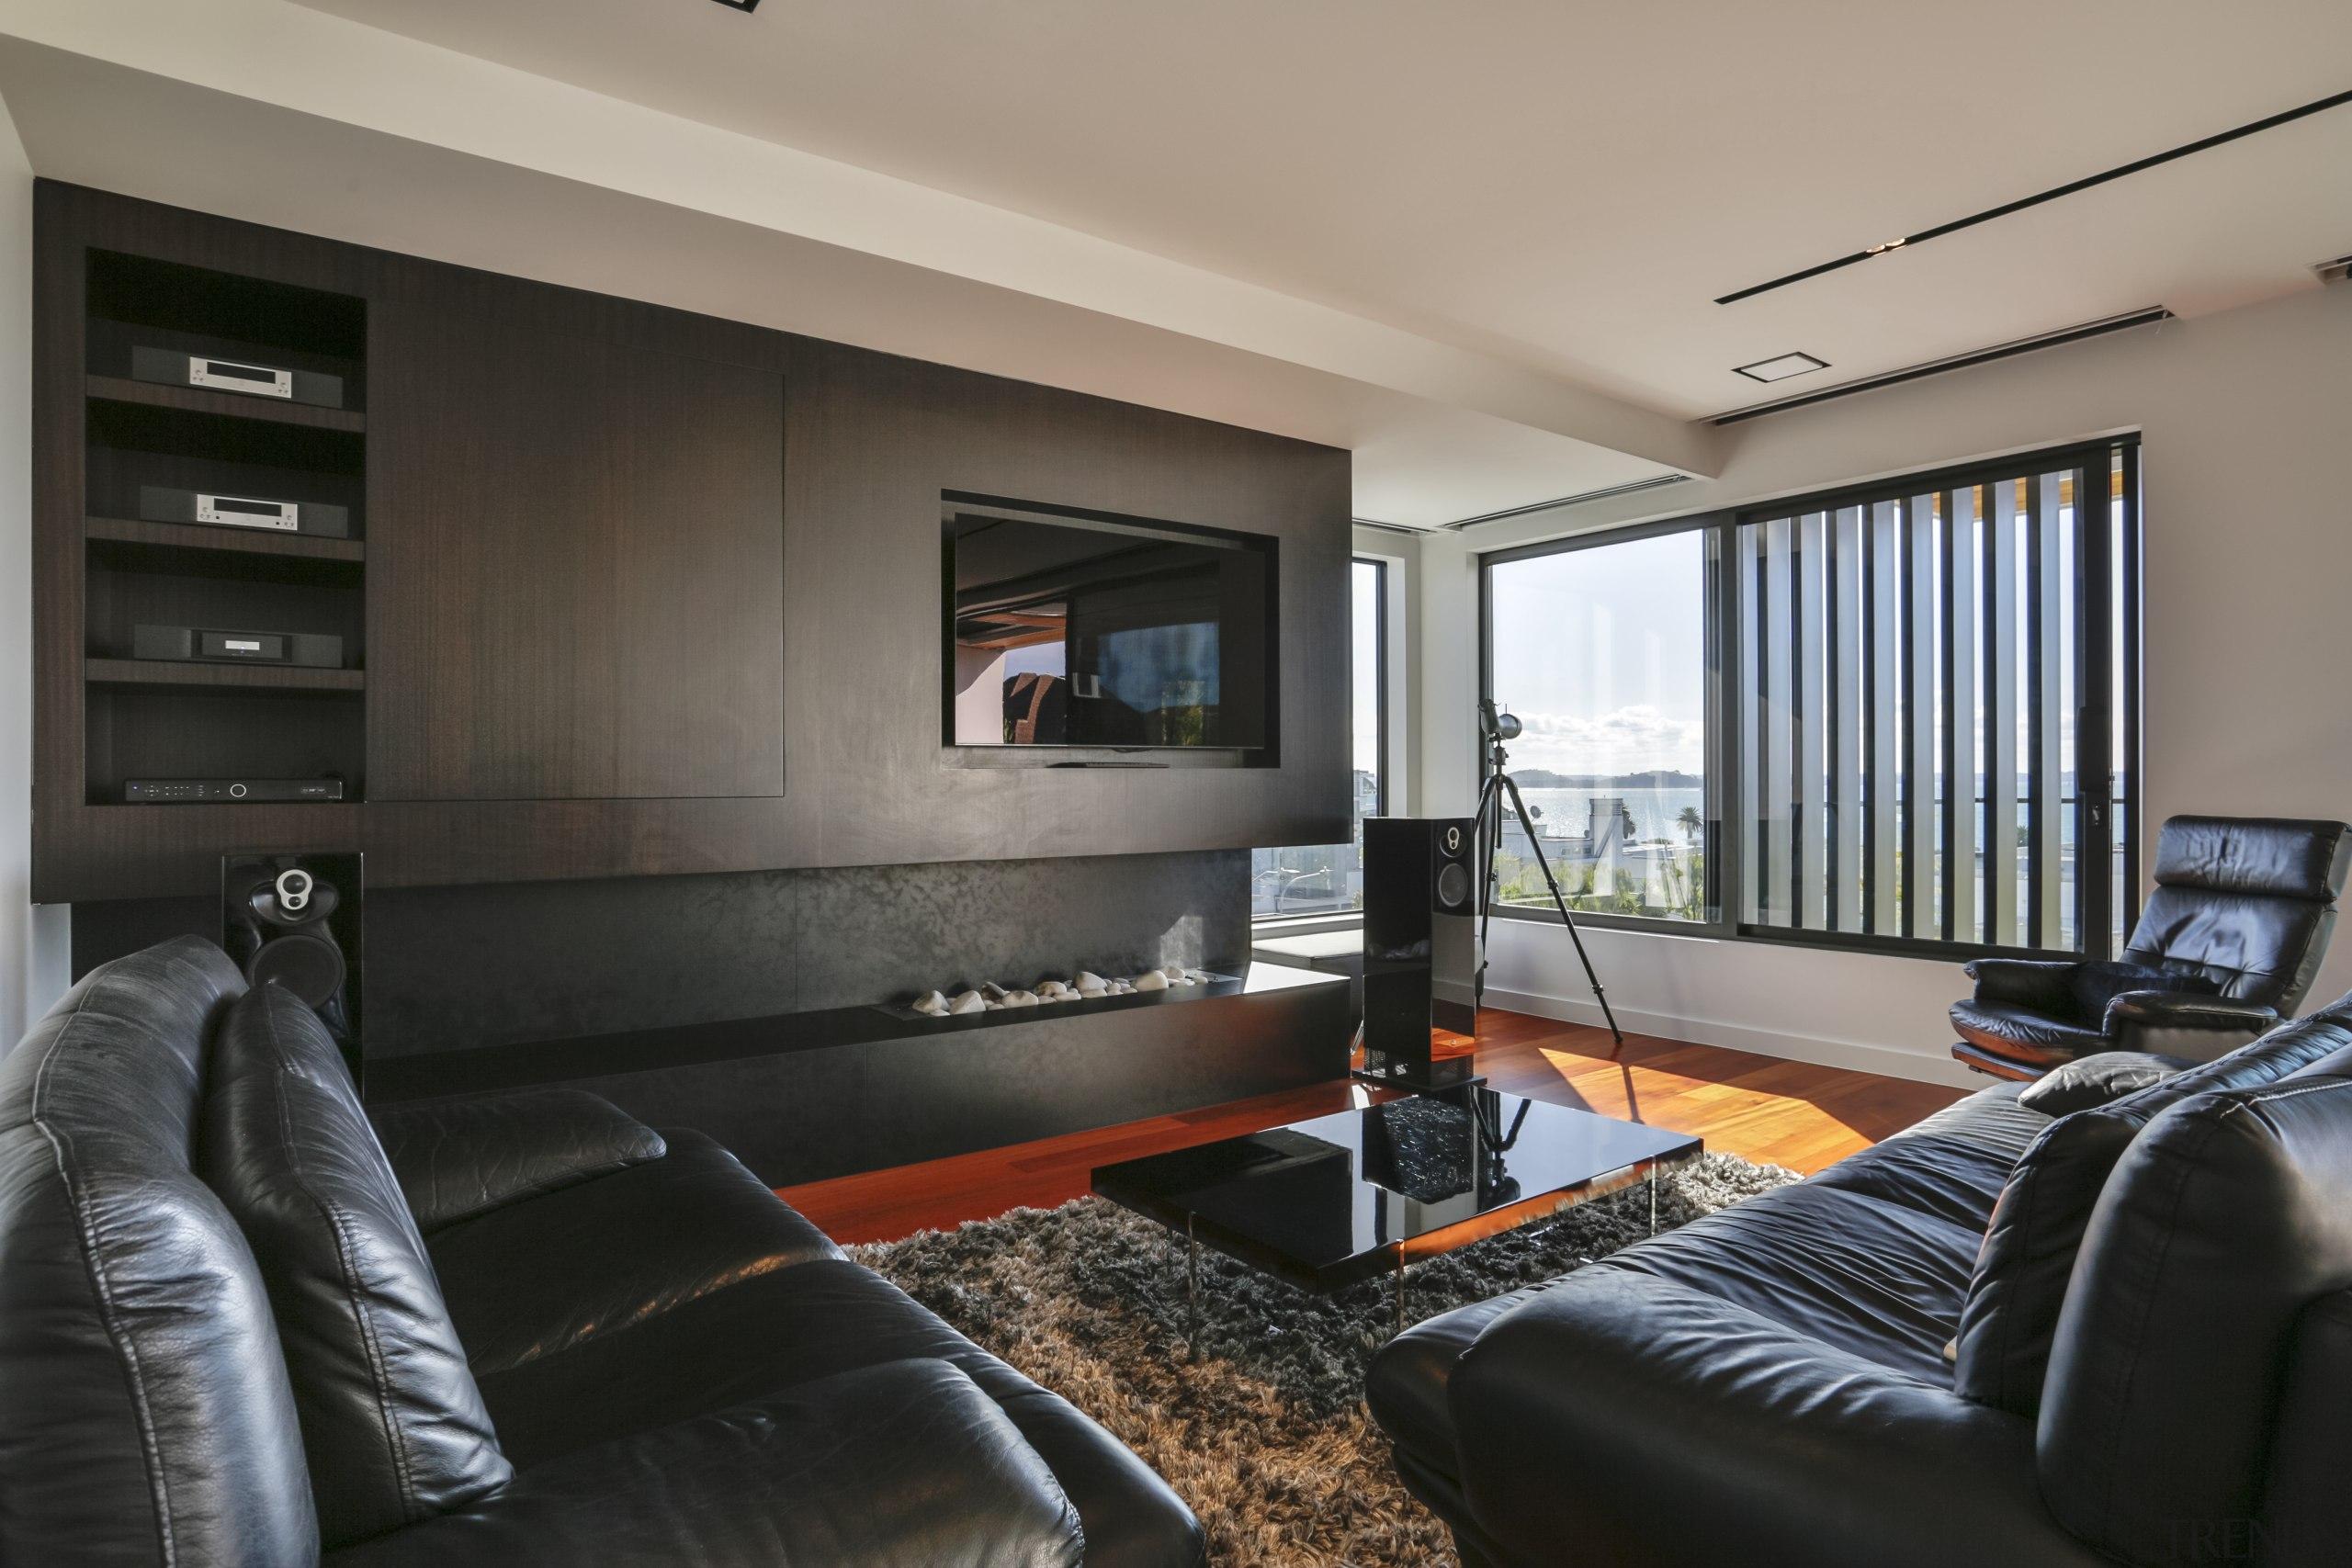 Dark living room cabinetry anchors the white, open gray, black